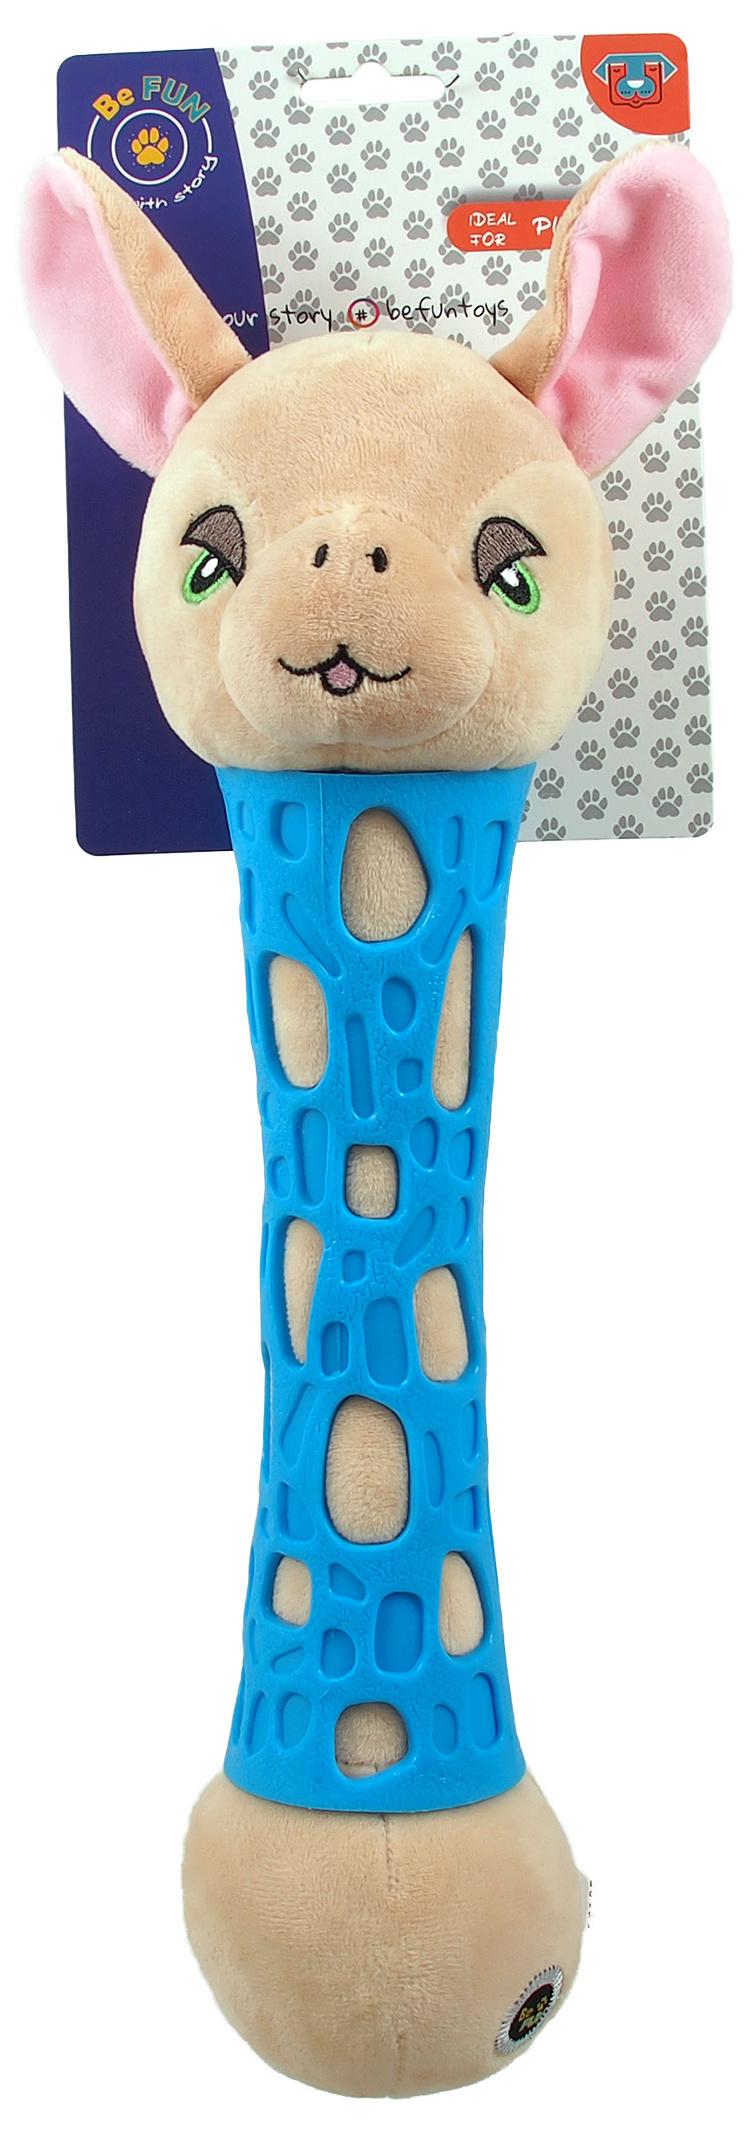 BeFun hračka TPR plyšová ovečka 37 cm